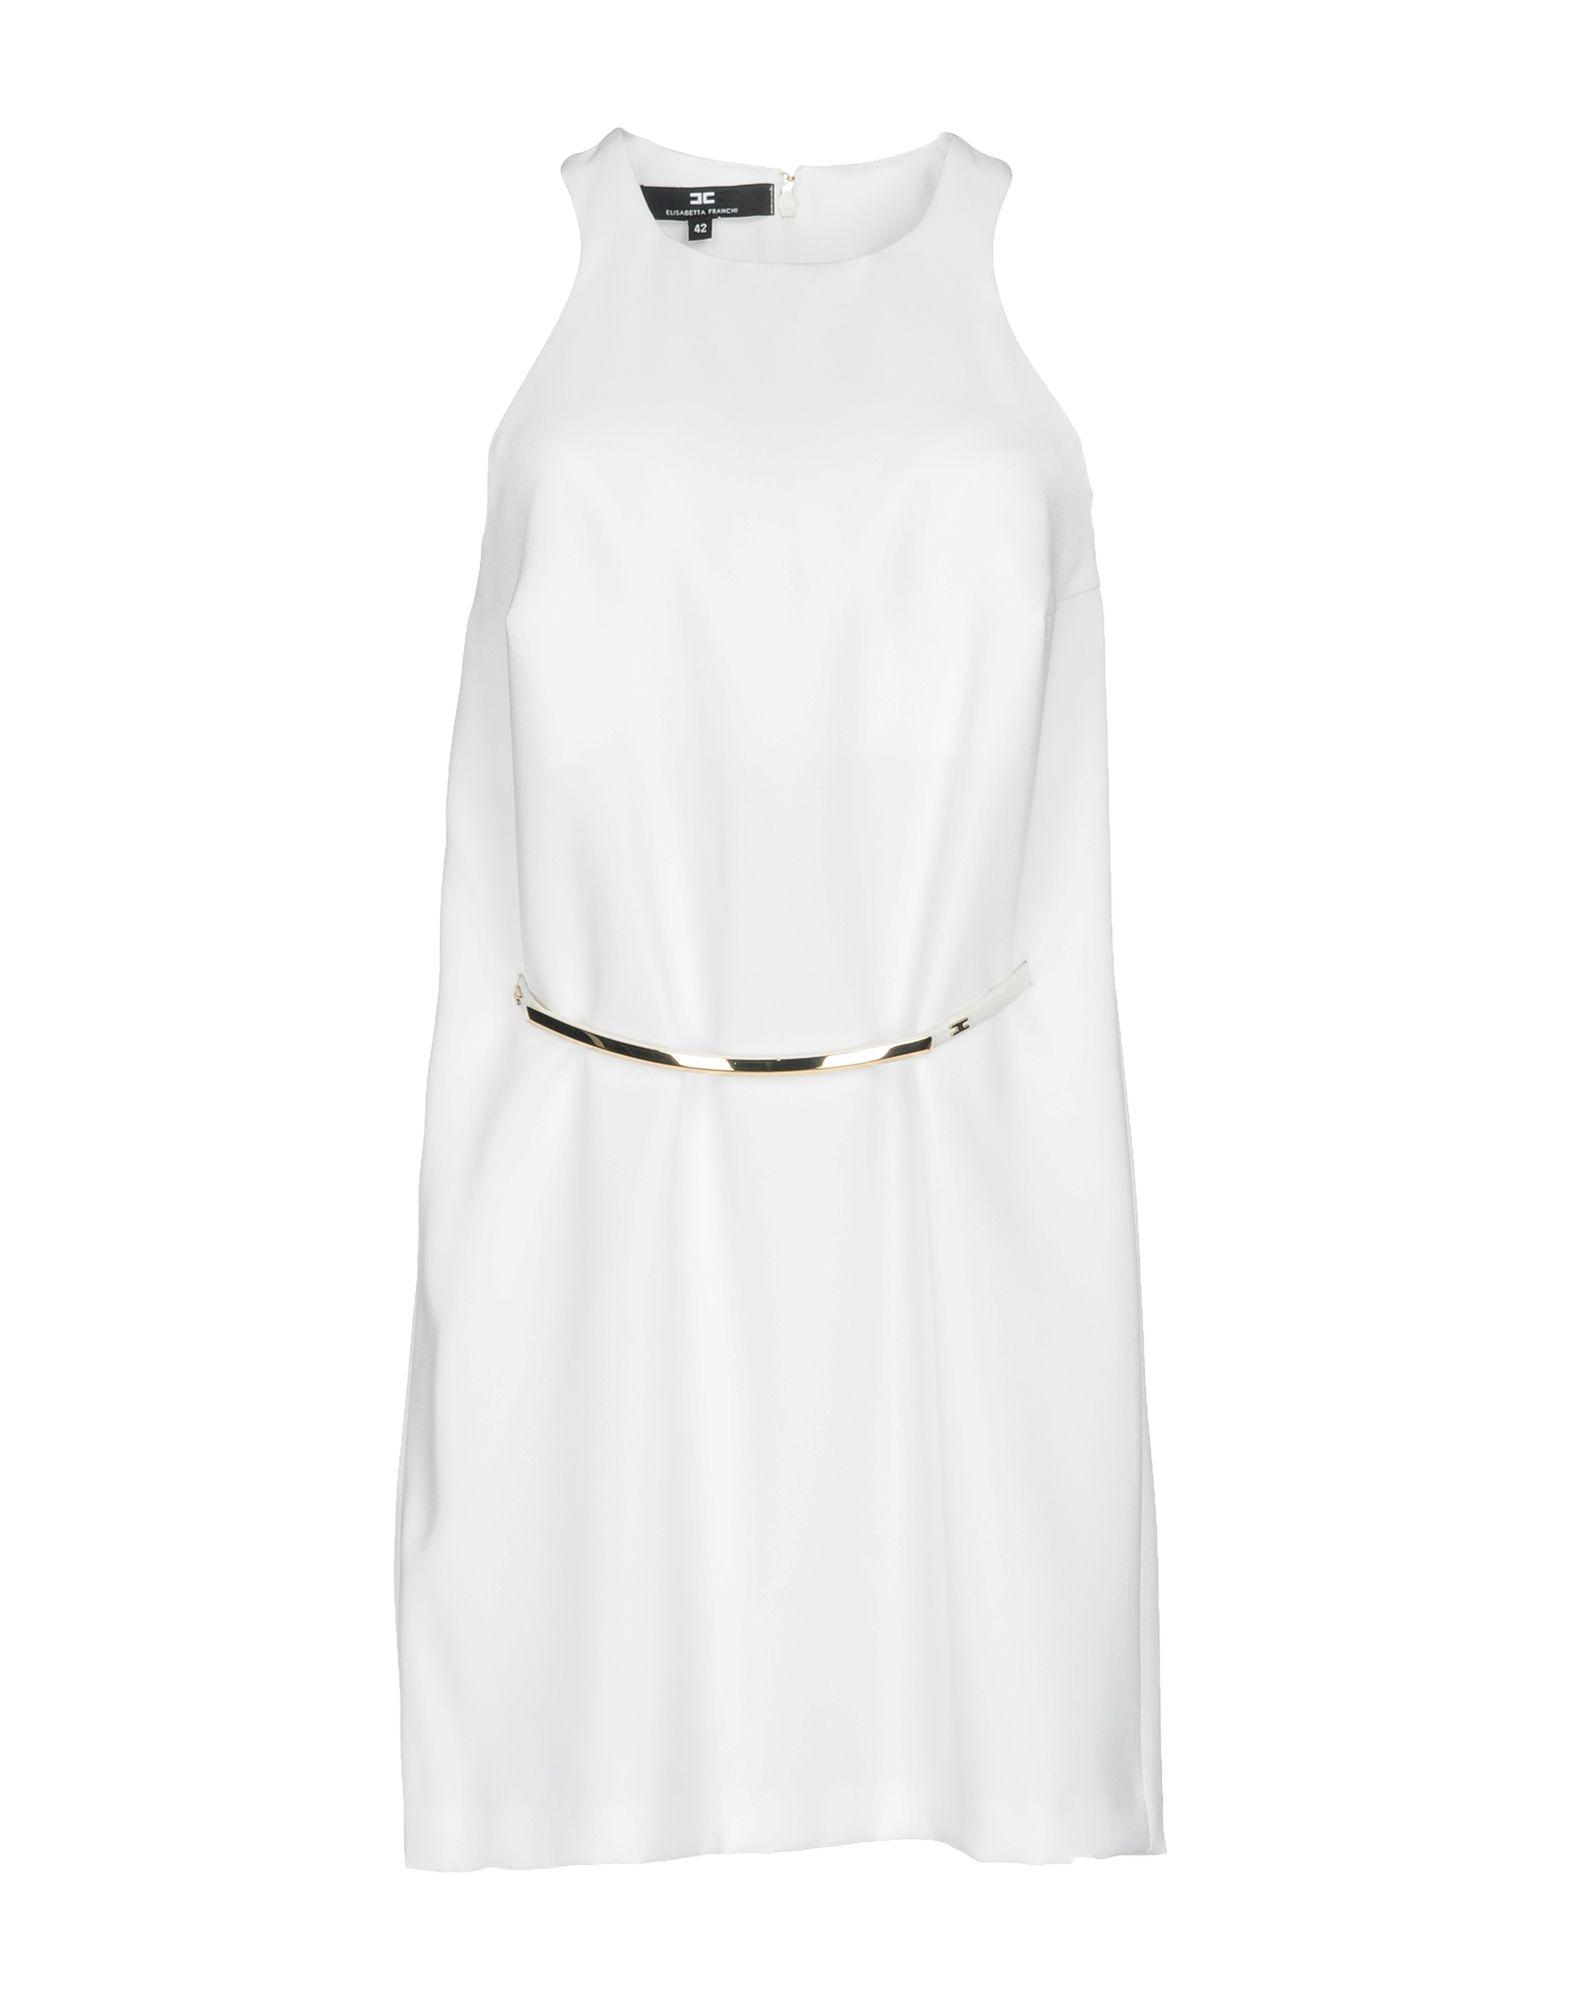 ELISABETTA FRANCHI 24 ORE Короткое платье elisabetta franchi футболка